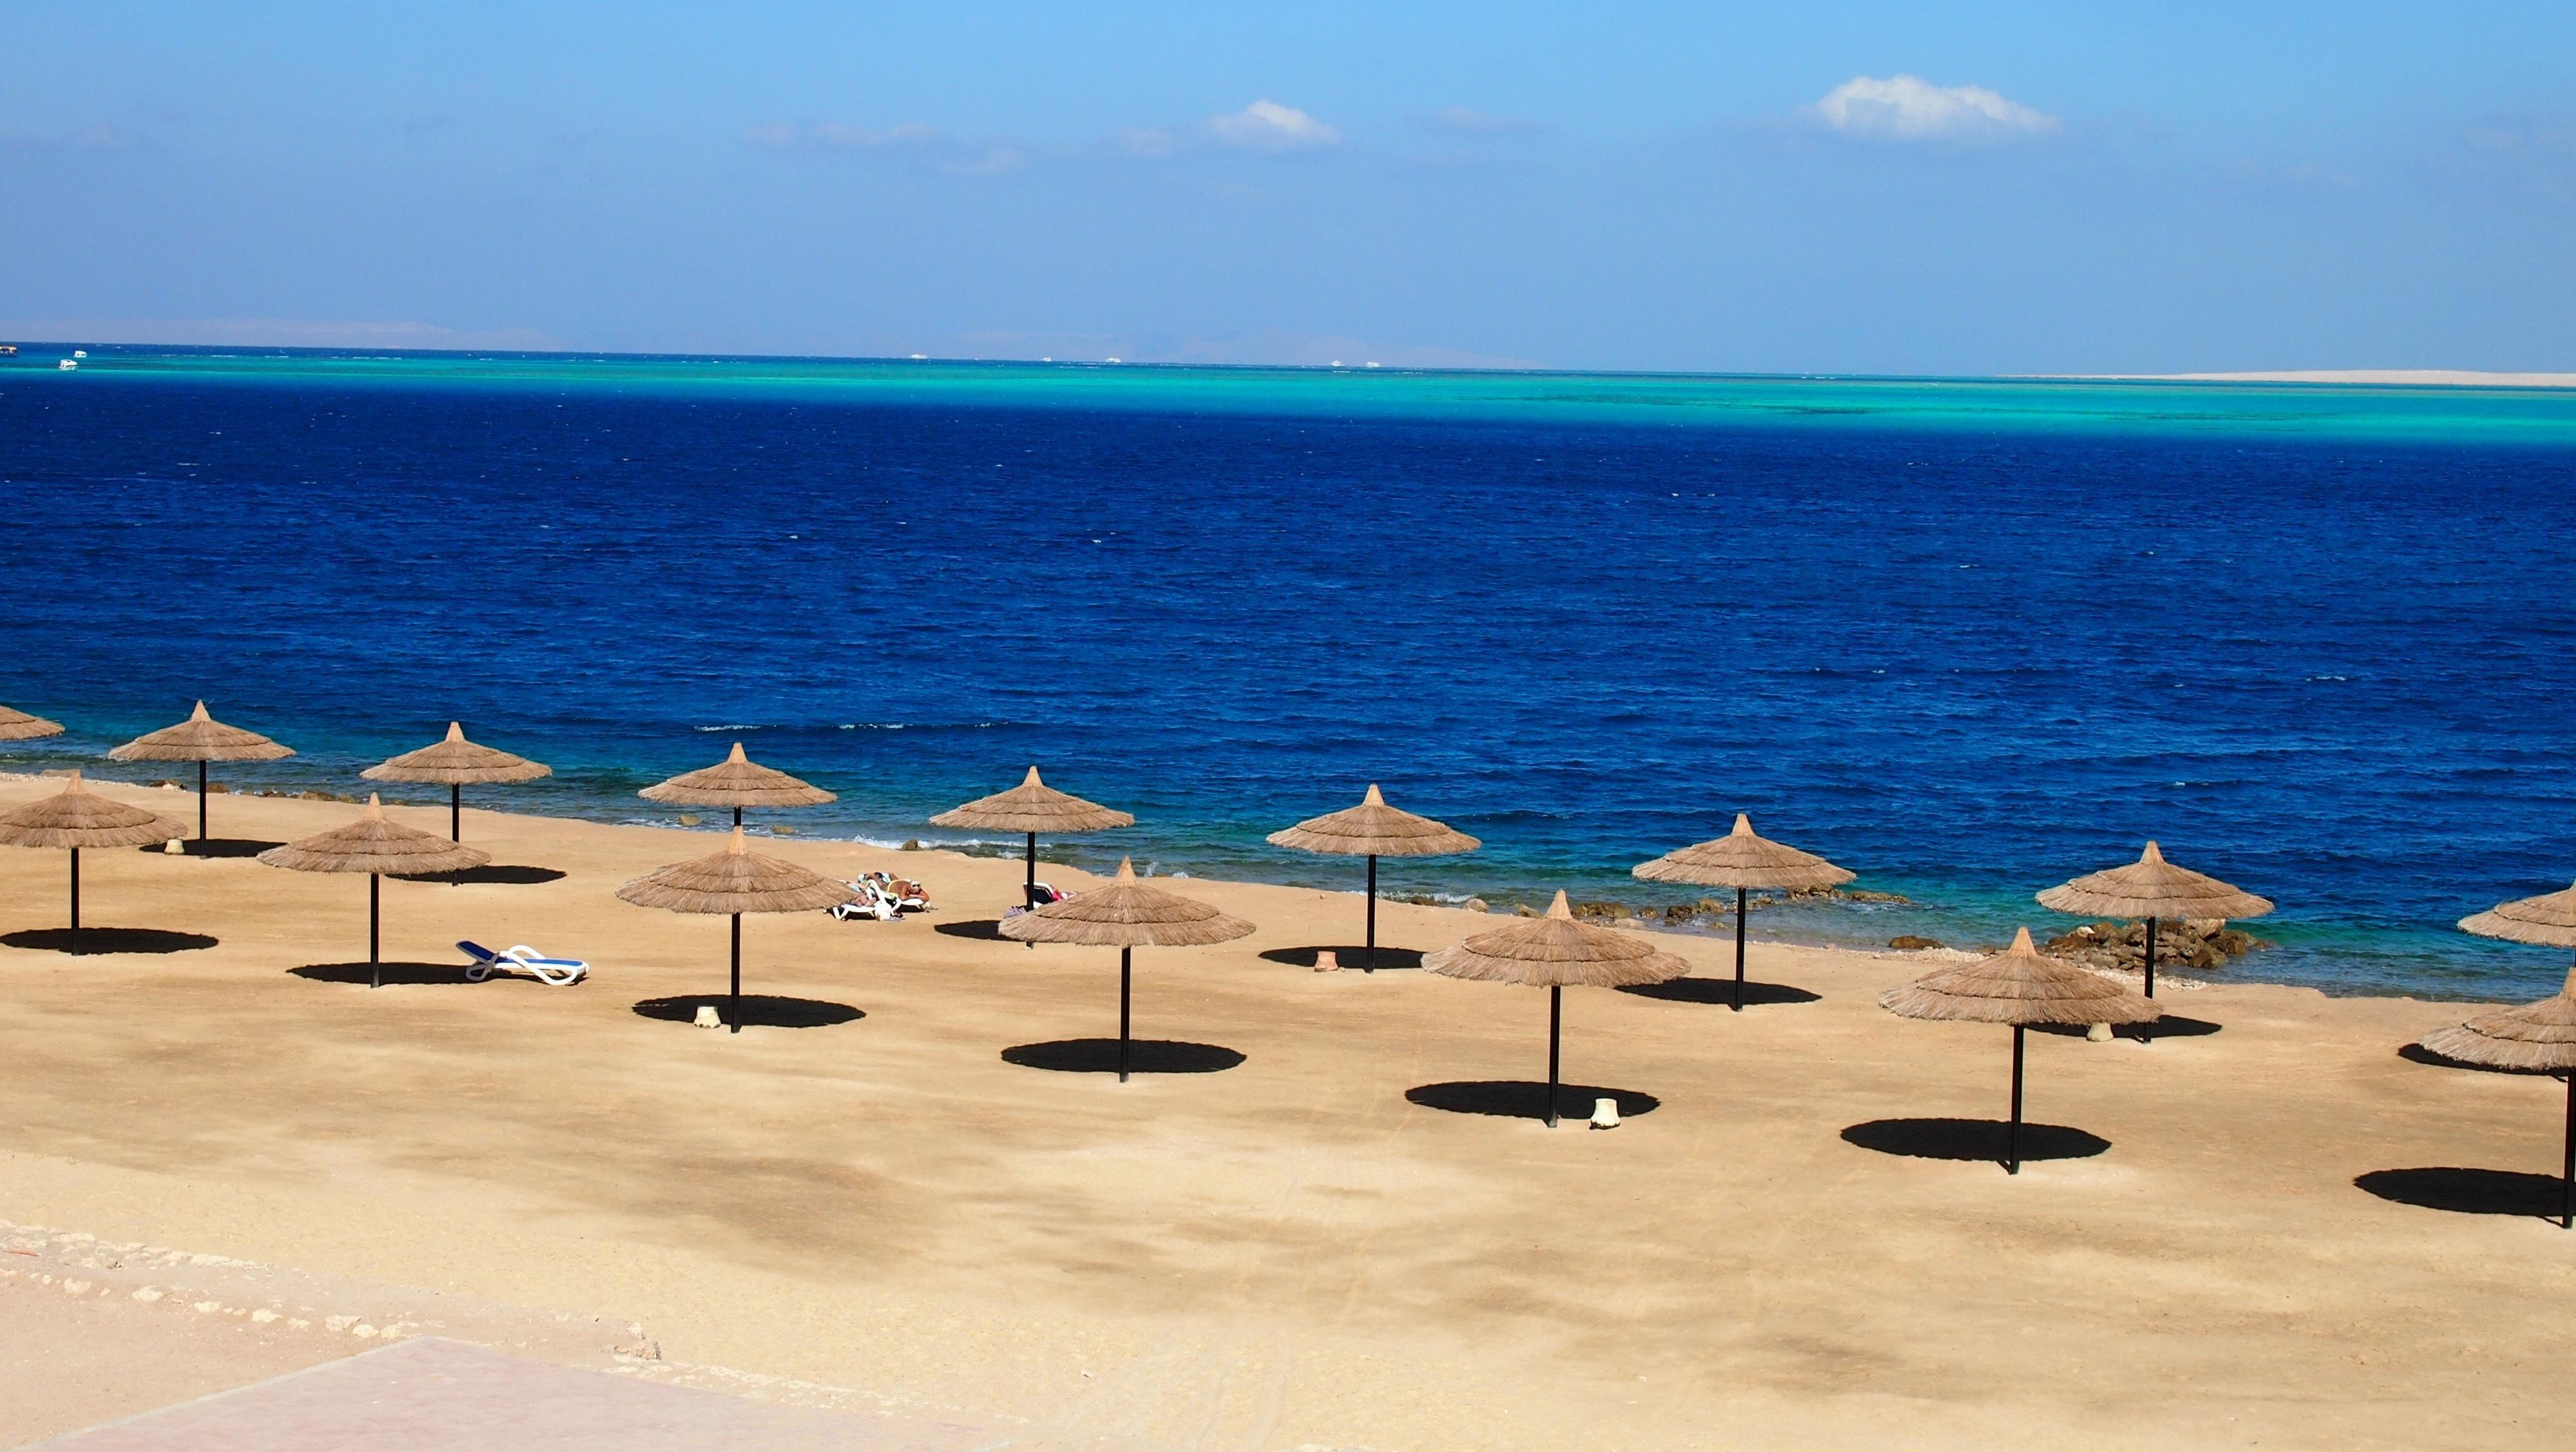 World___Egypt_Parasols_at_the_resort_of_